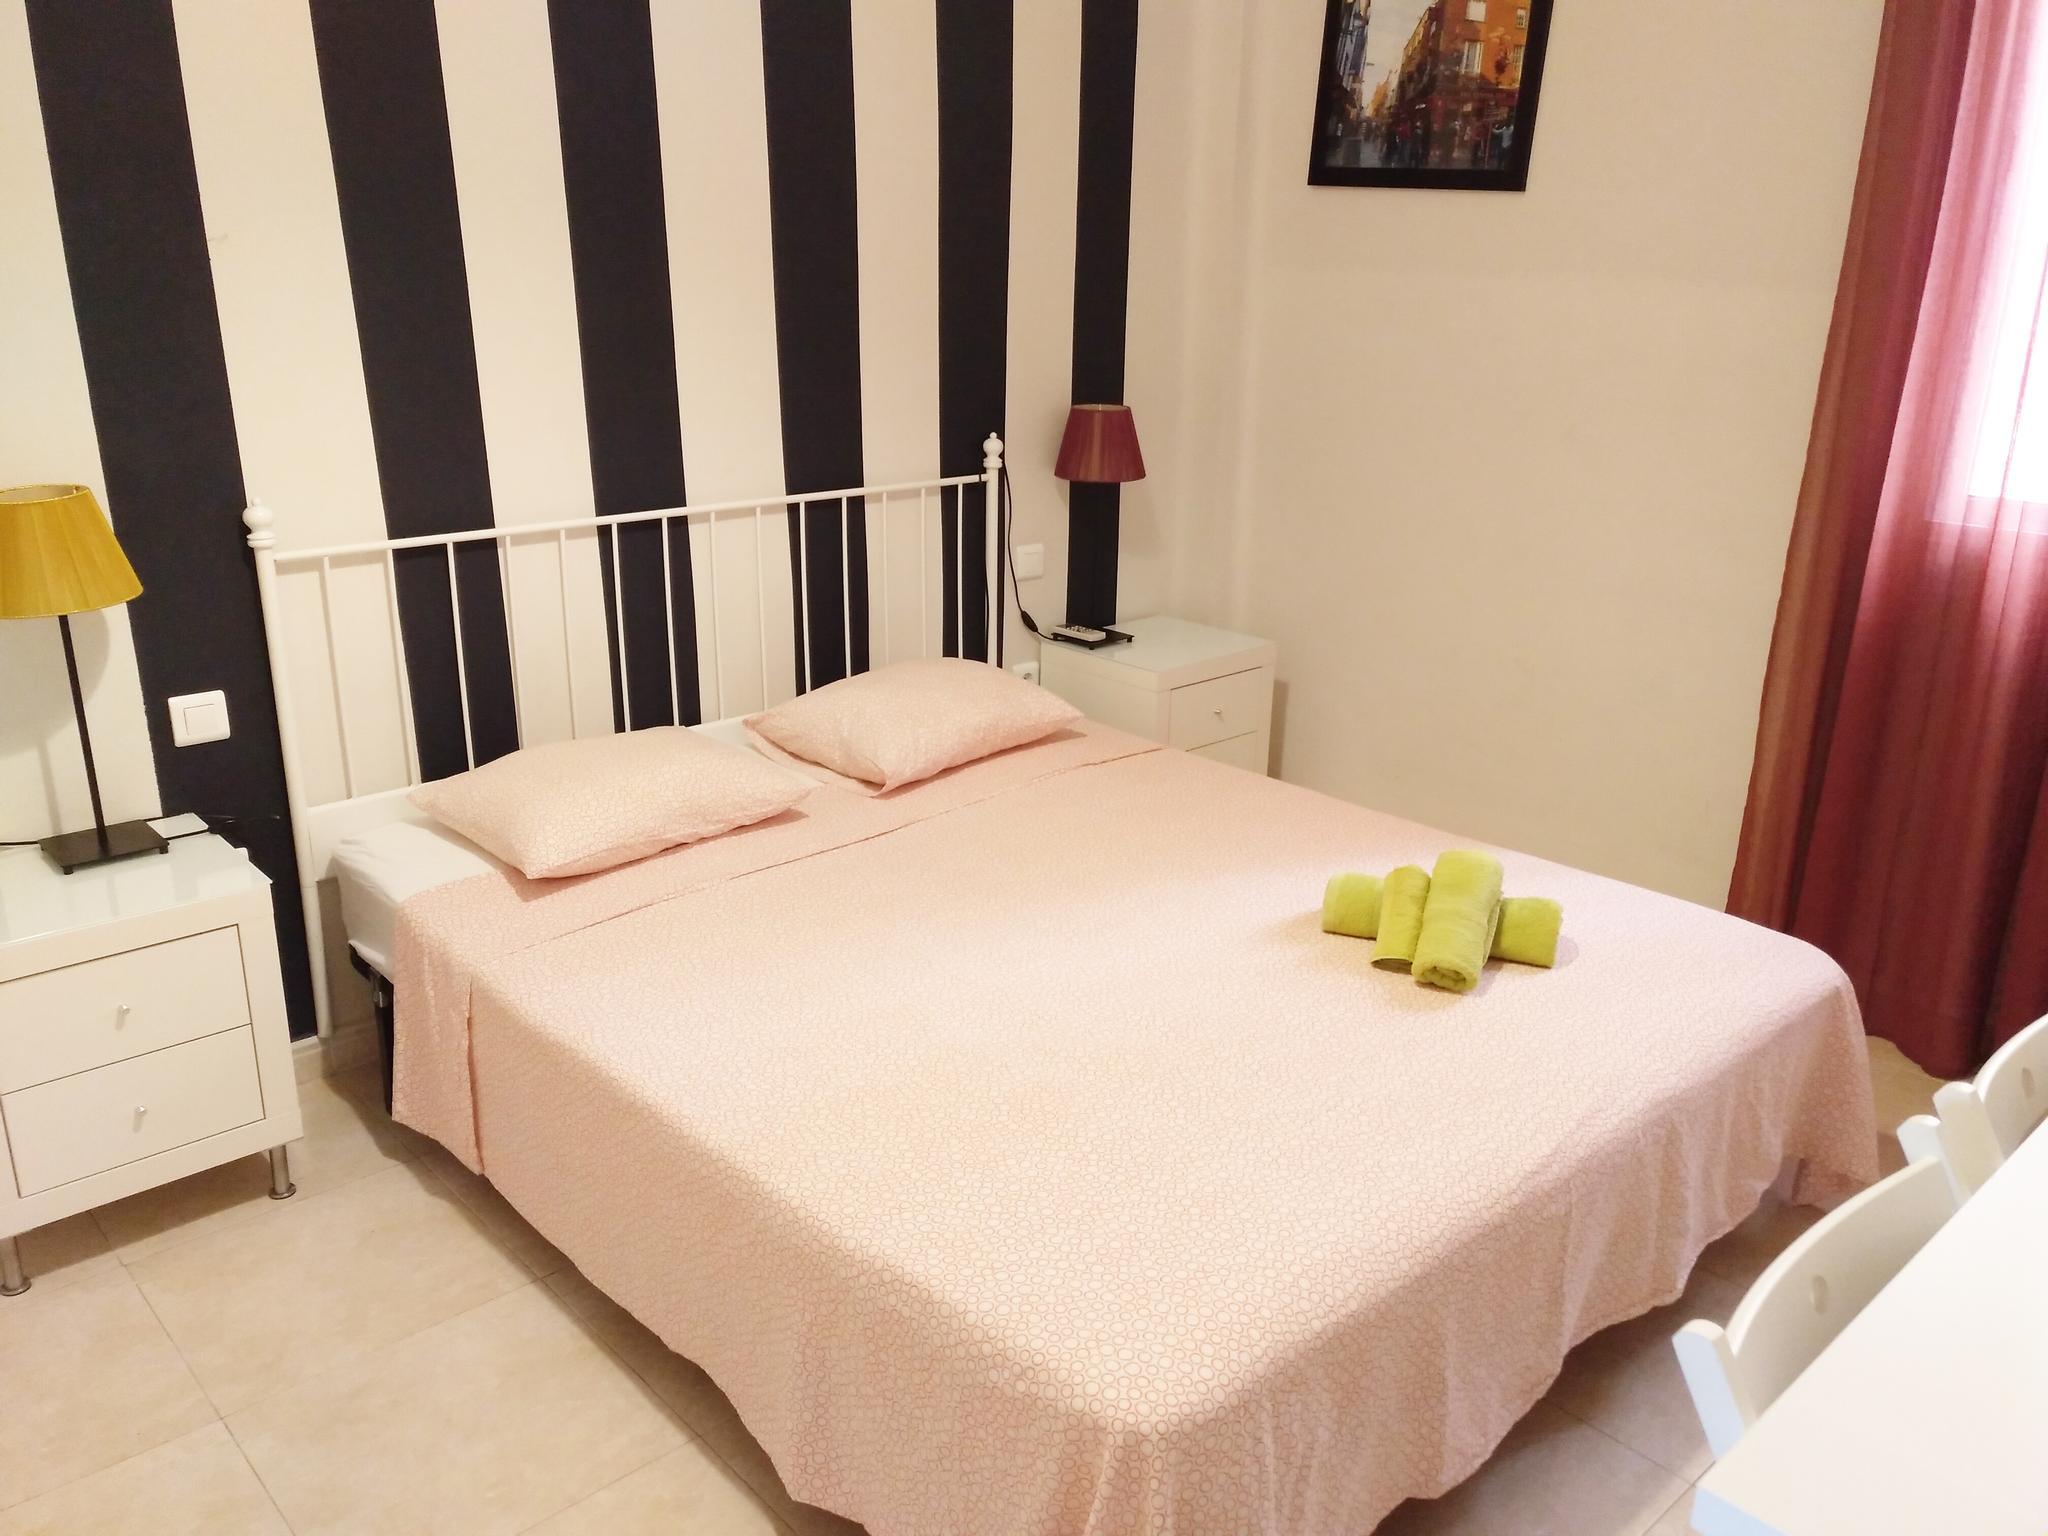 Heredia - Double bedroom in a flat Malaga